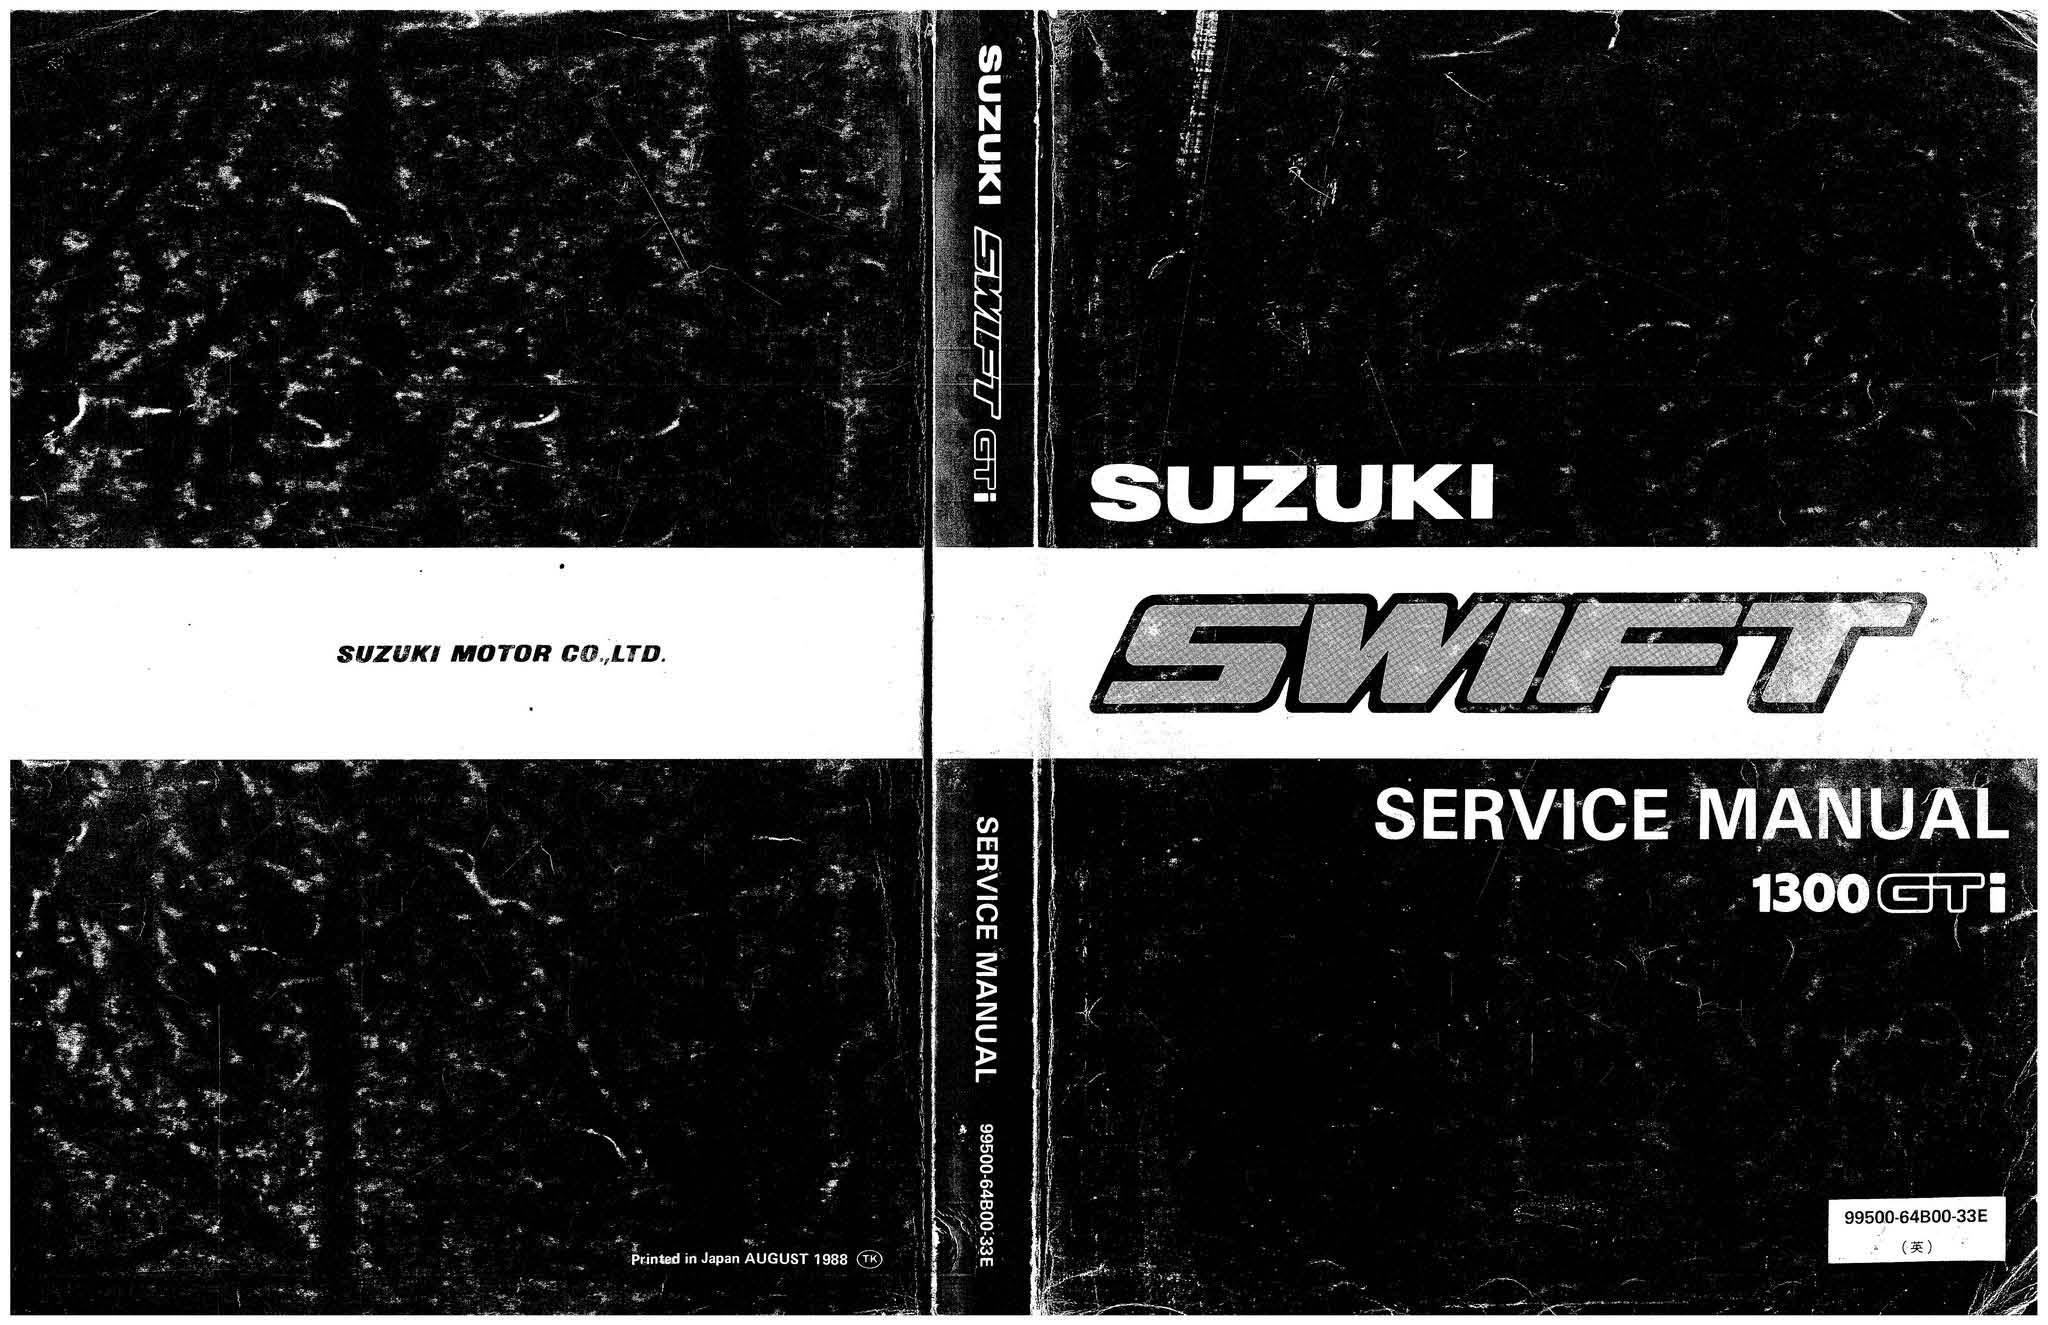 suzuki swift 1300 gti picture 9 reviews news specs buy car rh gomotors net Suzuki Swift suzuki swift gti workshop repair manual download